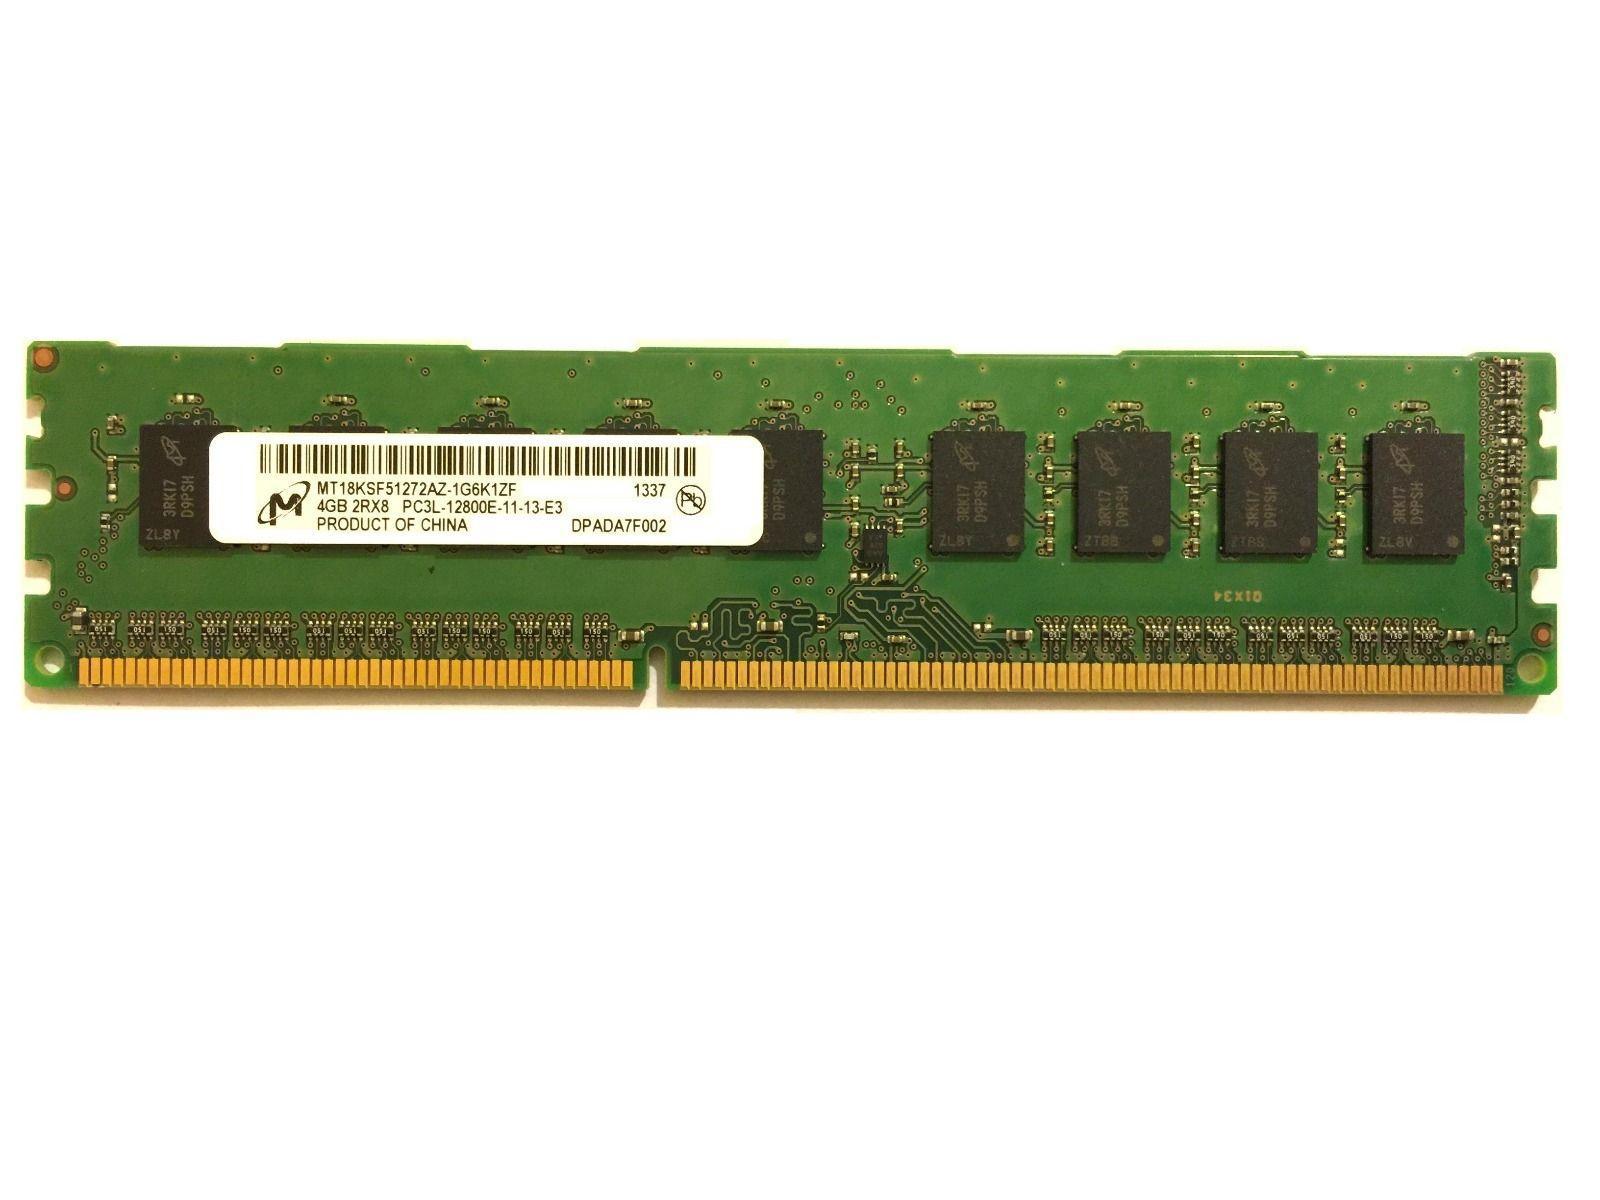 Hynix 2Gb Ddr3 Pc3-12800 1600Mhz Ecc Registered Cl11 1.5V Single Rank